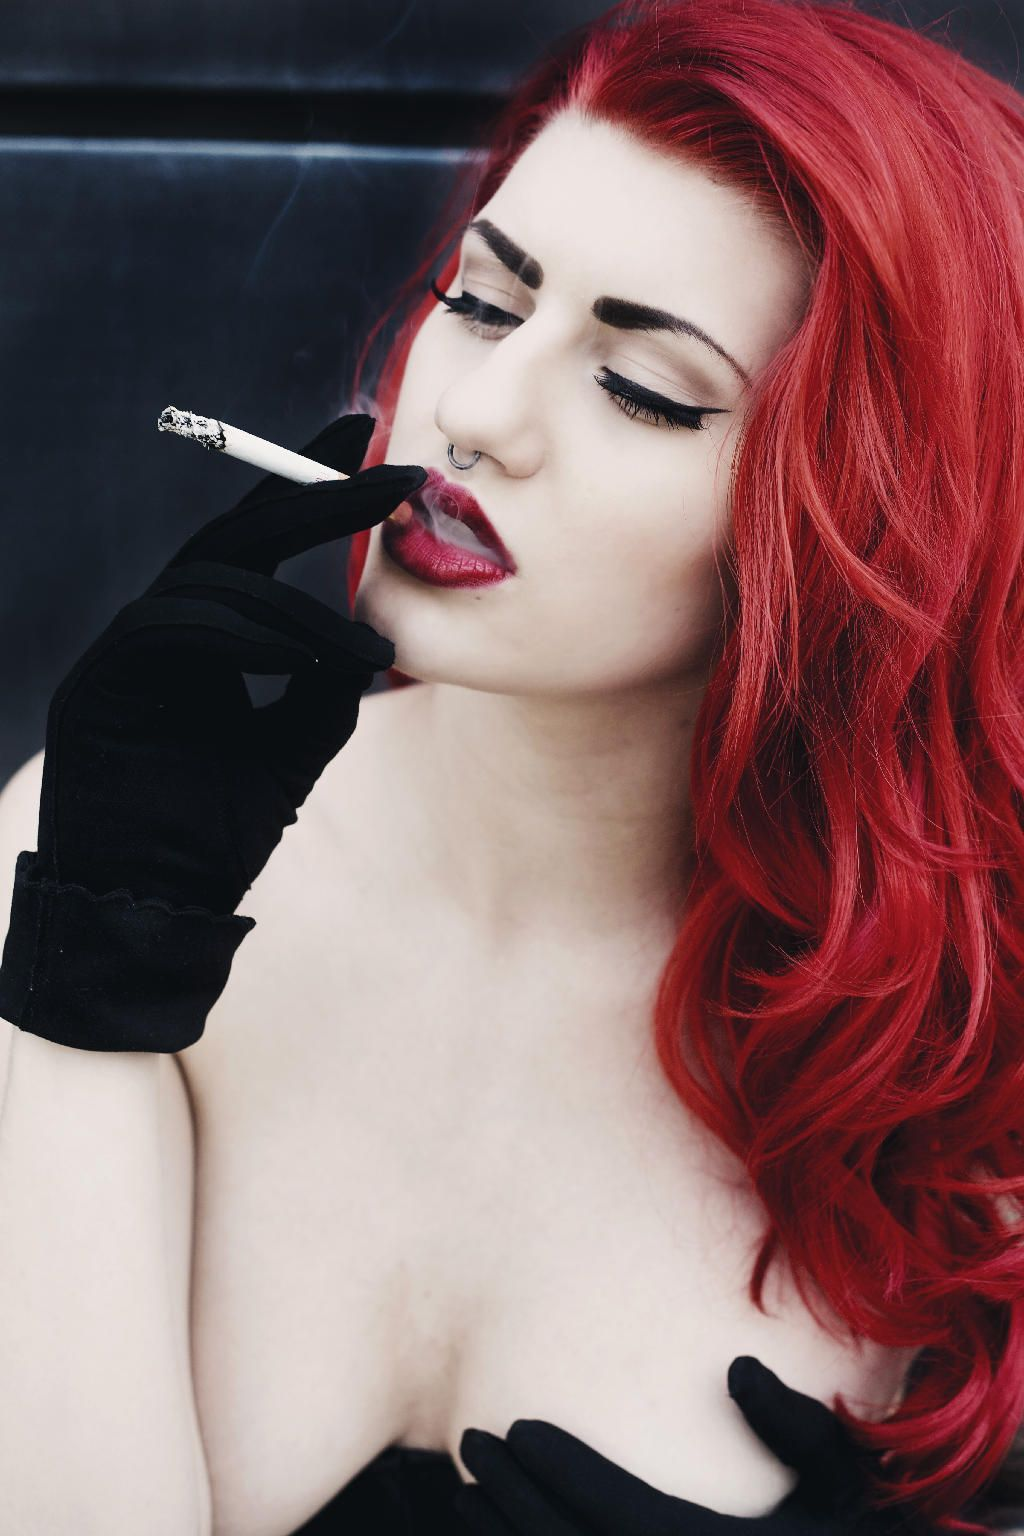 Smoking redhead(SMK AT END)